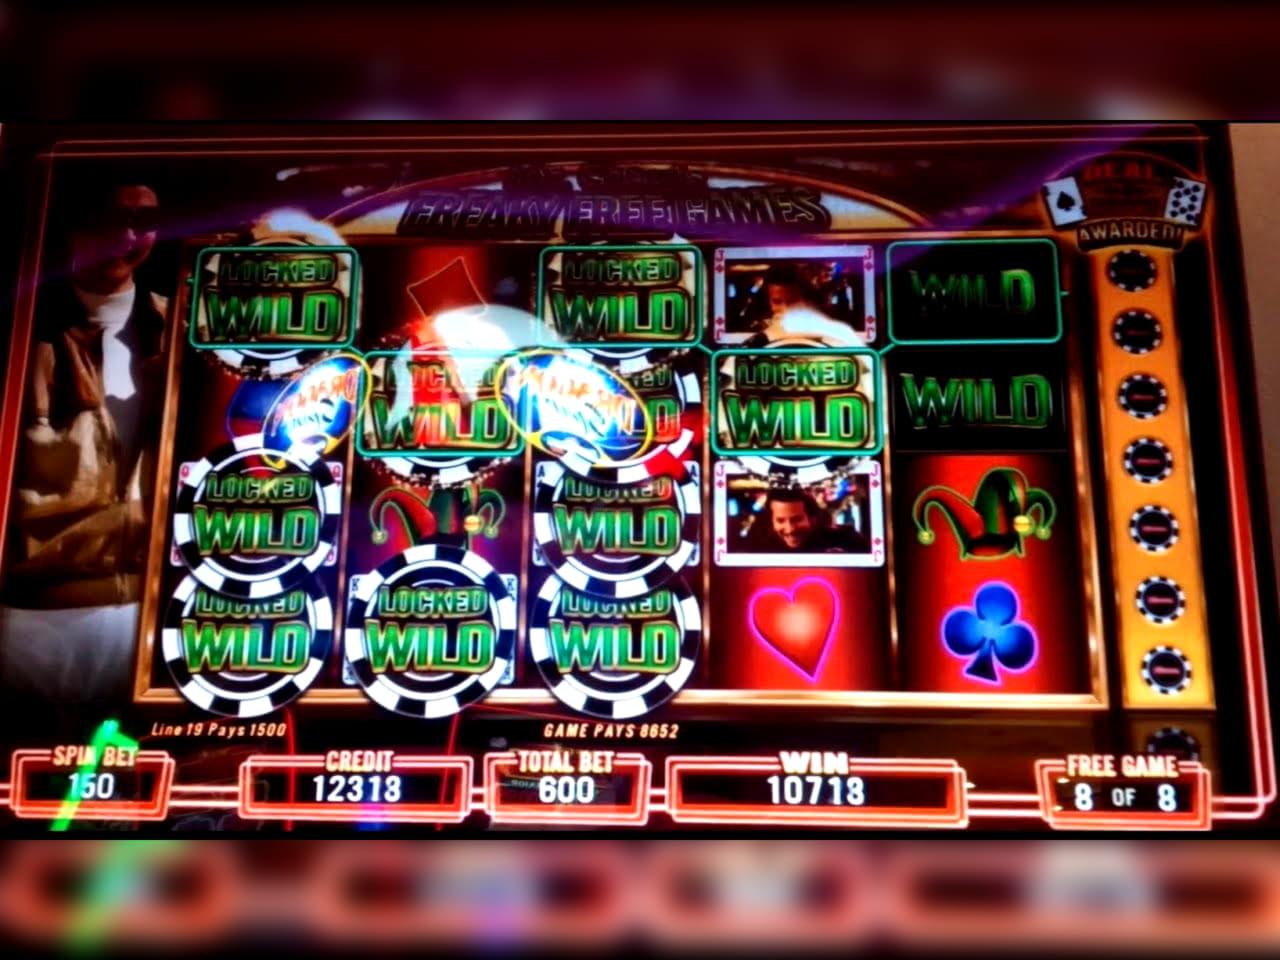 255 Free لا تدور أي كازينو إيداع في Intertops Casino